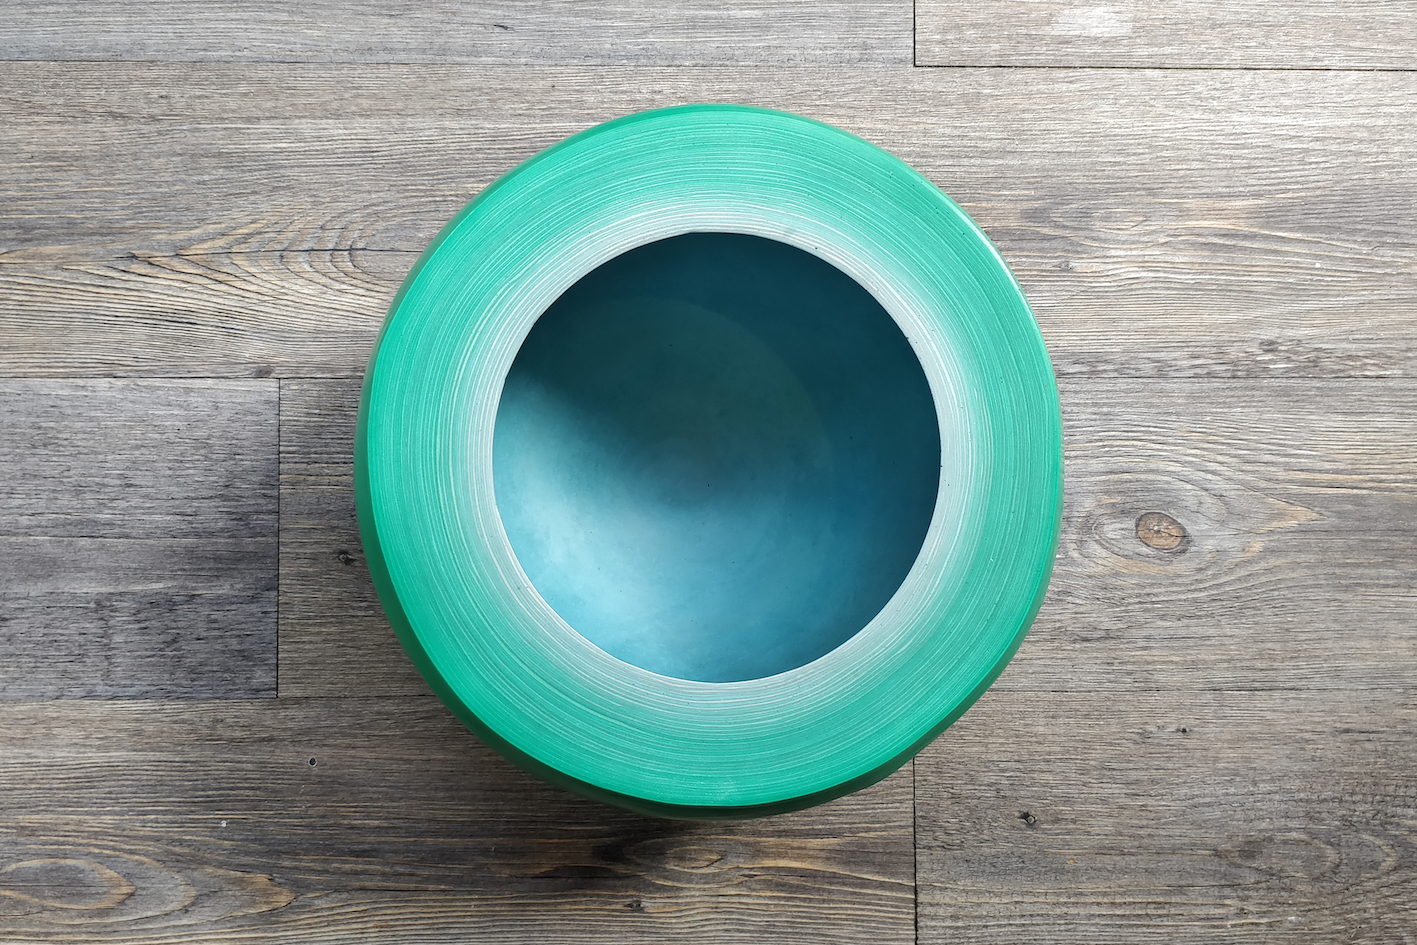 Fuzz Bowl Round / Turquoise Light Blue